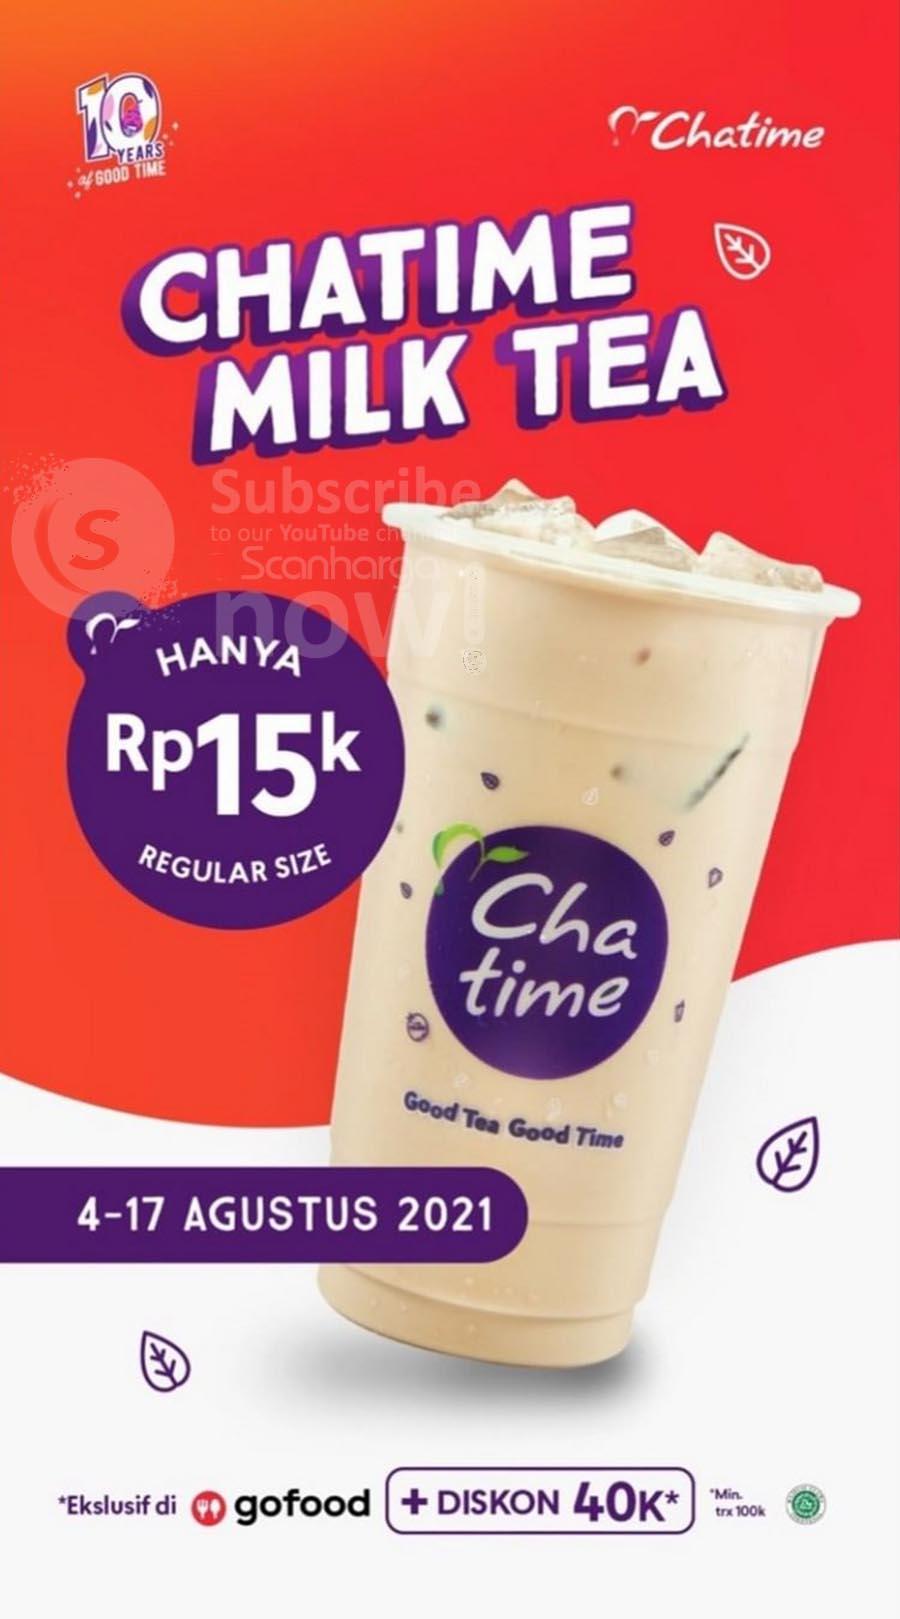 Promo Chatime MILK TEA harga hanya Rp. 15.000